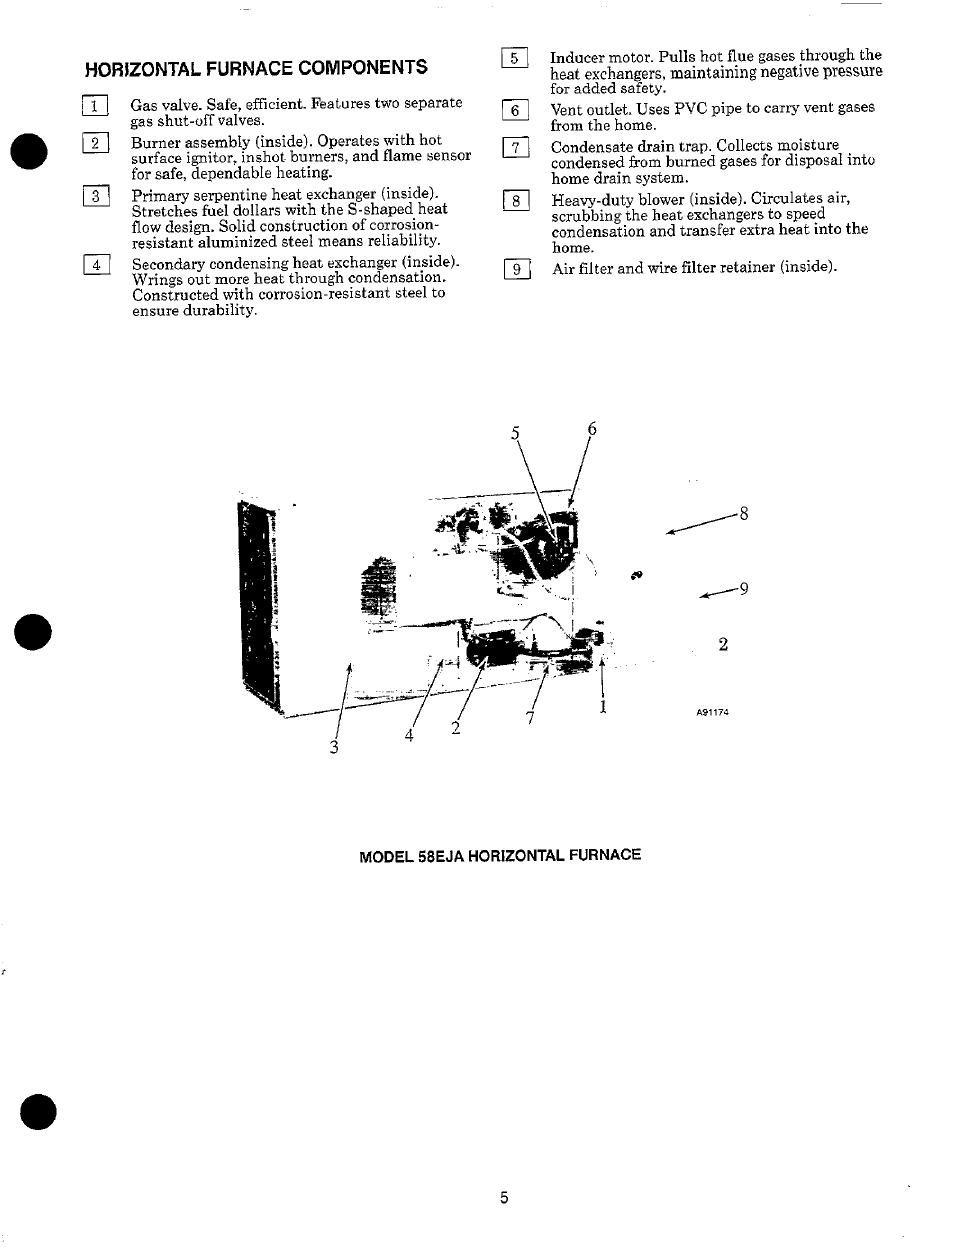 Horizontal furnace components, Model 58eja horizontal